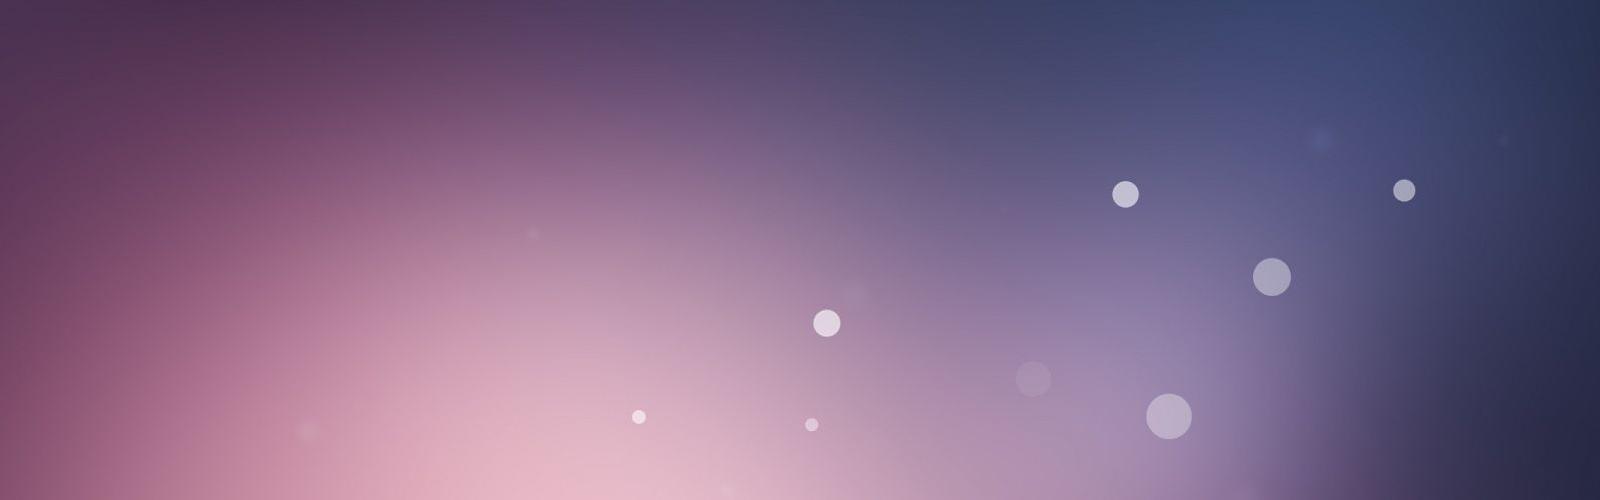 fondviolet